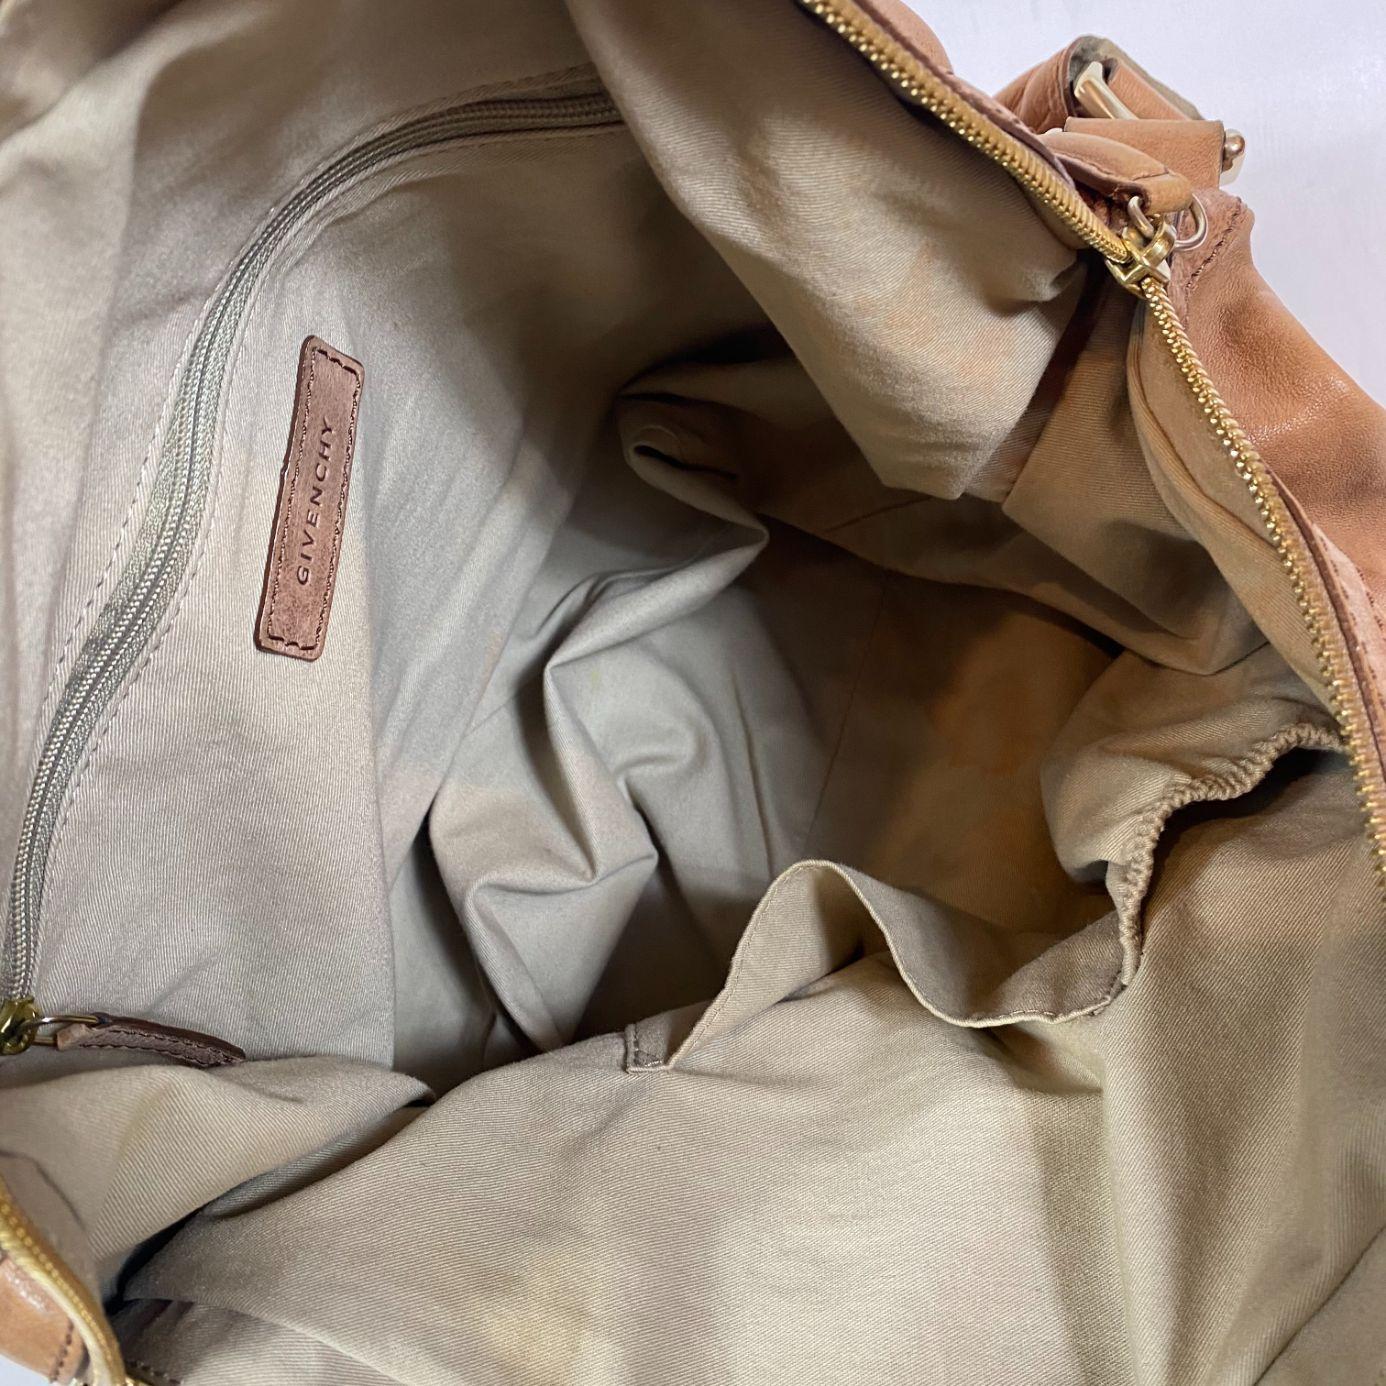 Bolsa Givenchy Nightingale Caramelo